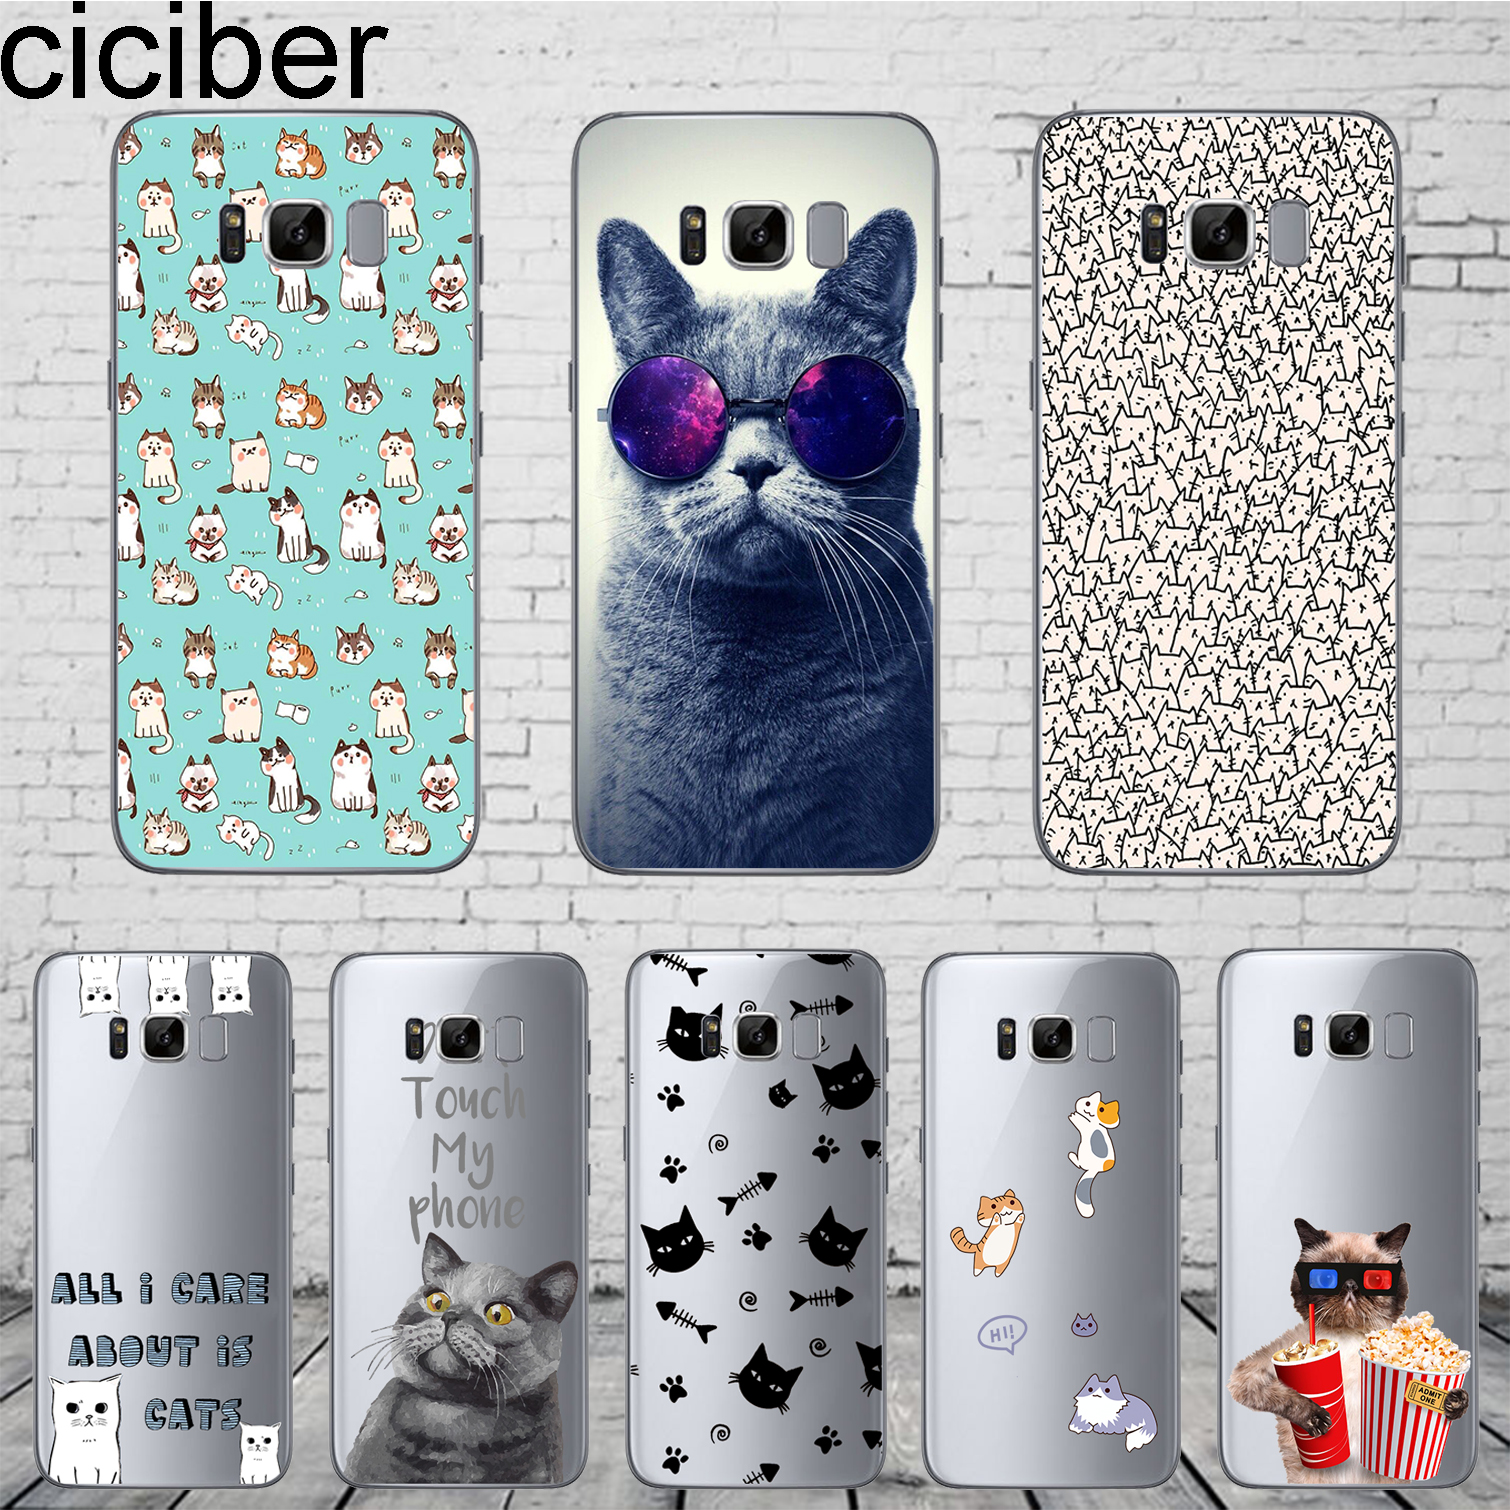 ciciber Animal Funny Cute Cartoon Cat Phone Case For Samsung Galaxy S7 S9 S6 Edge S8 Plus Soft Silicone TPU Cover Coque